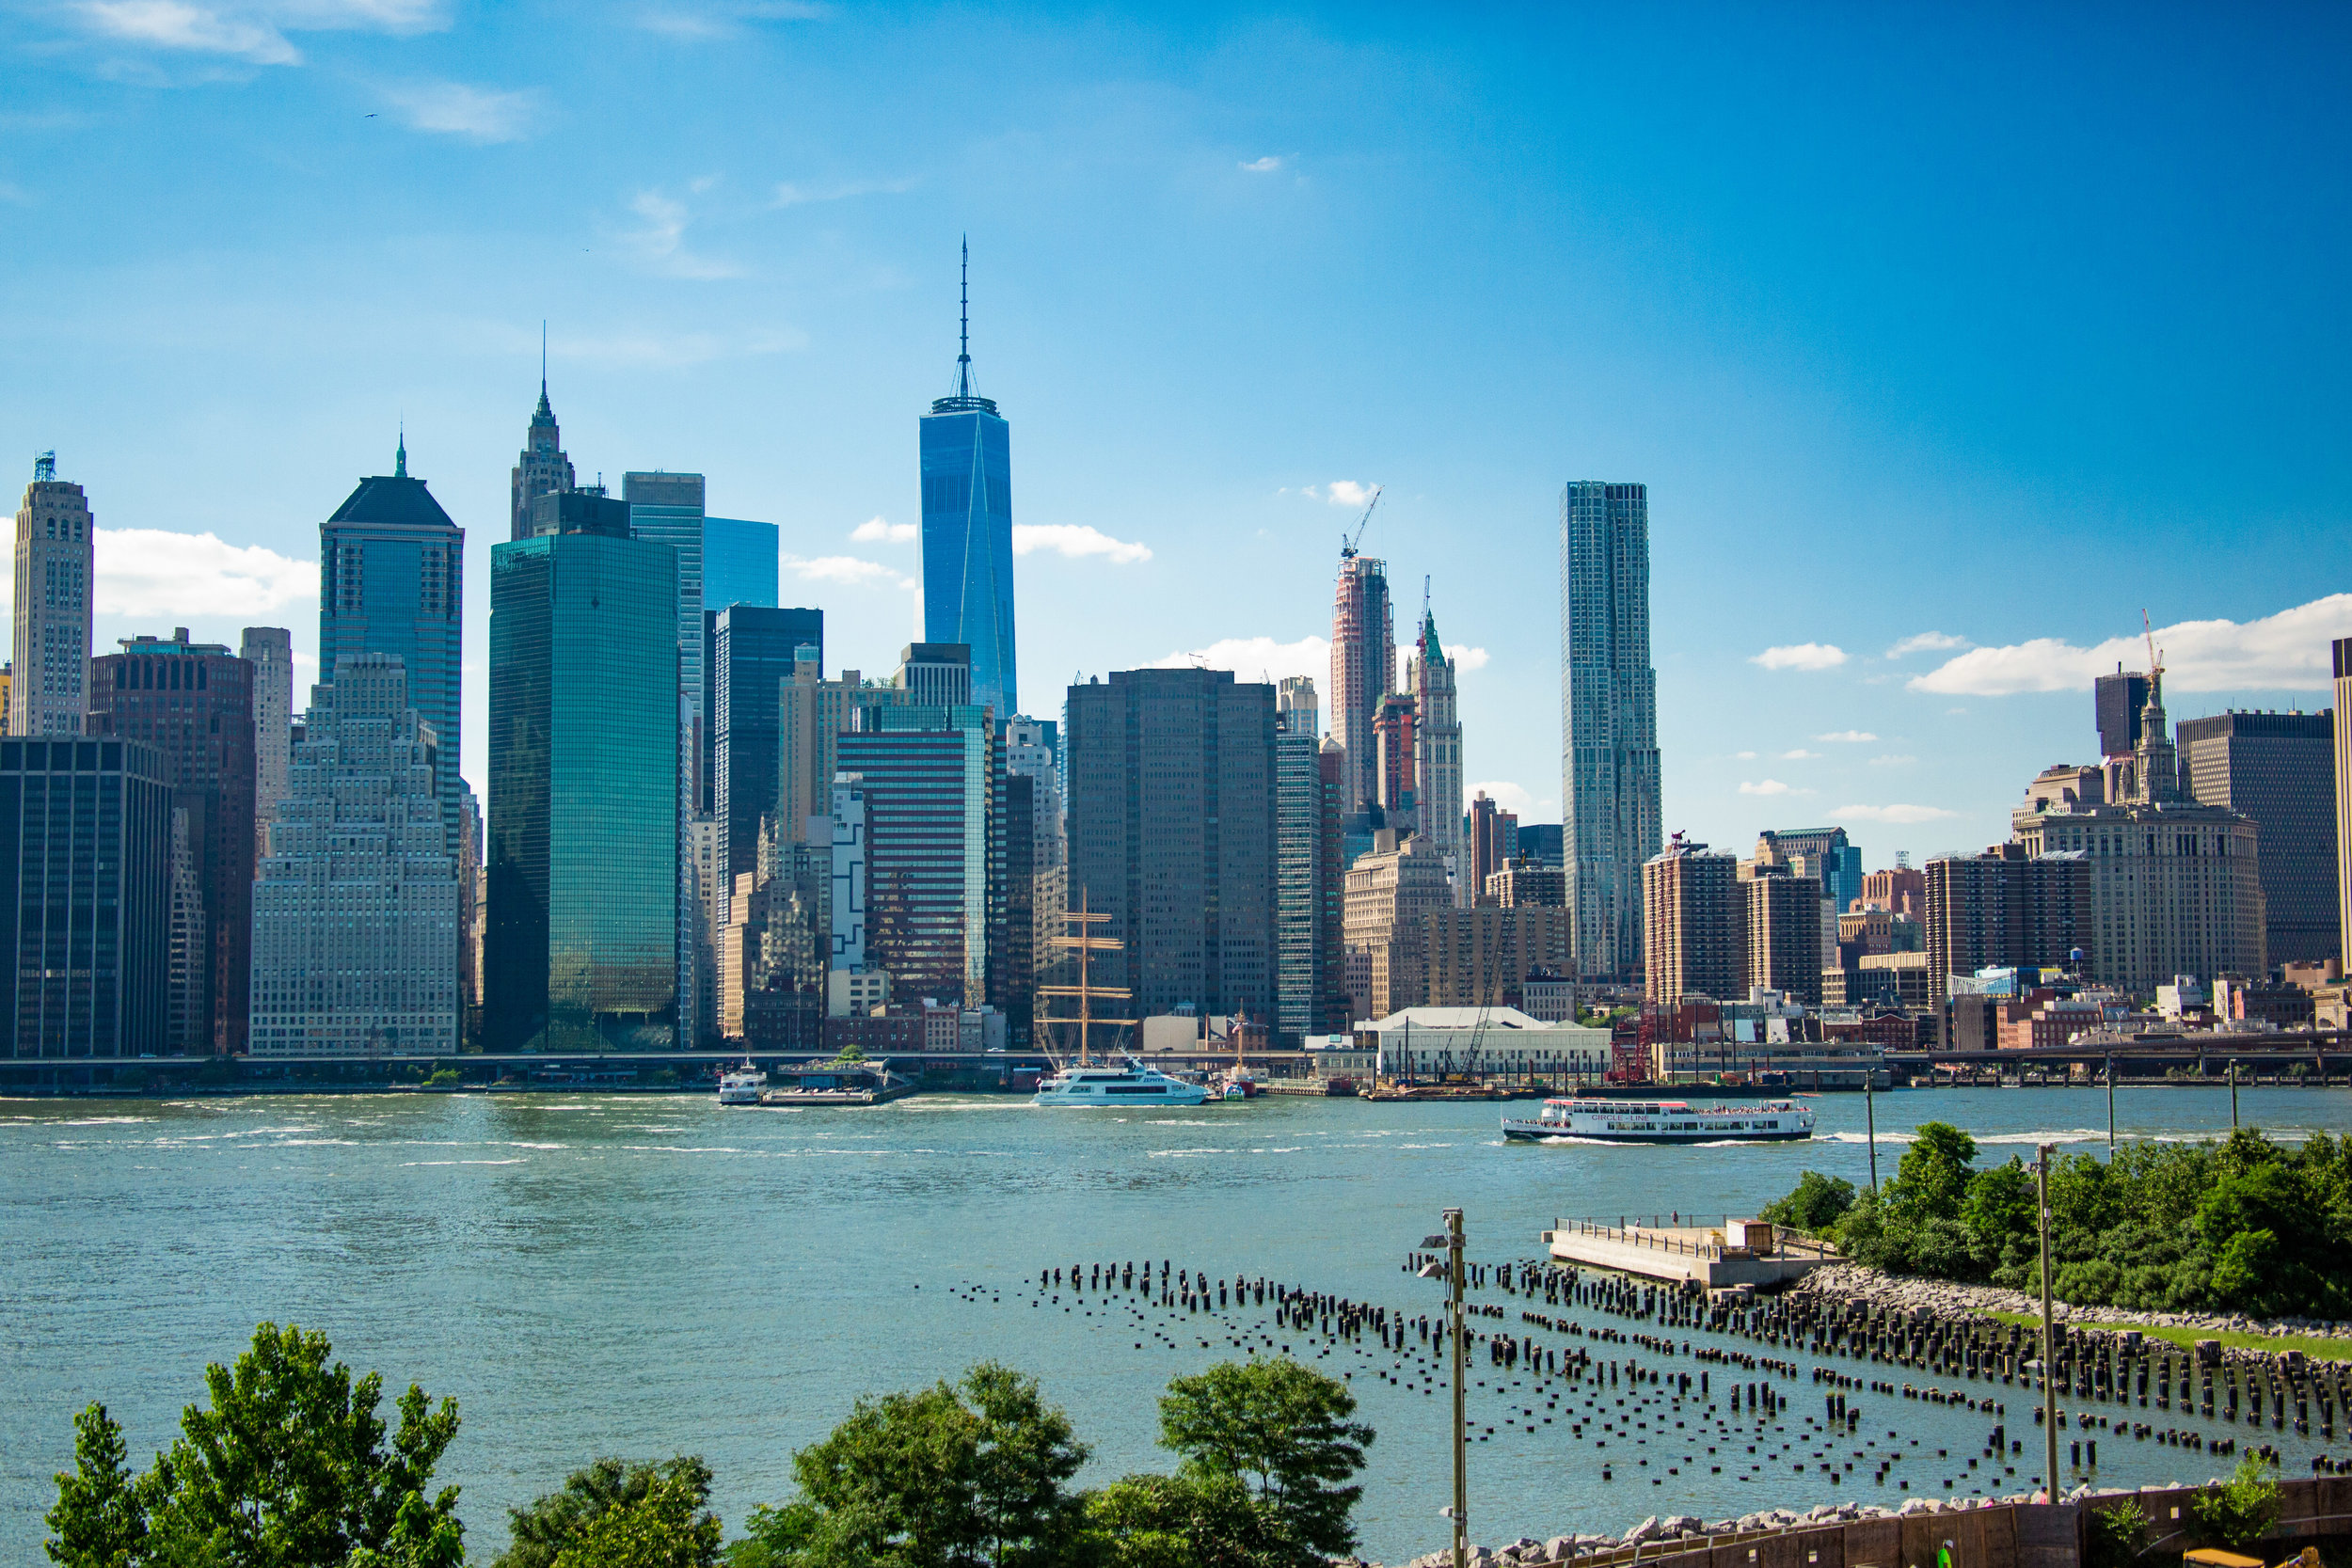 LSNY_Brooklyn_Bridge_Park-82.jpg